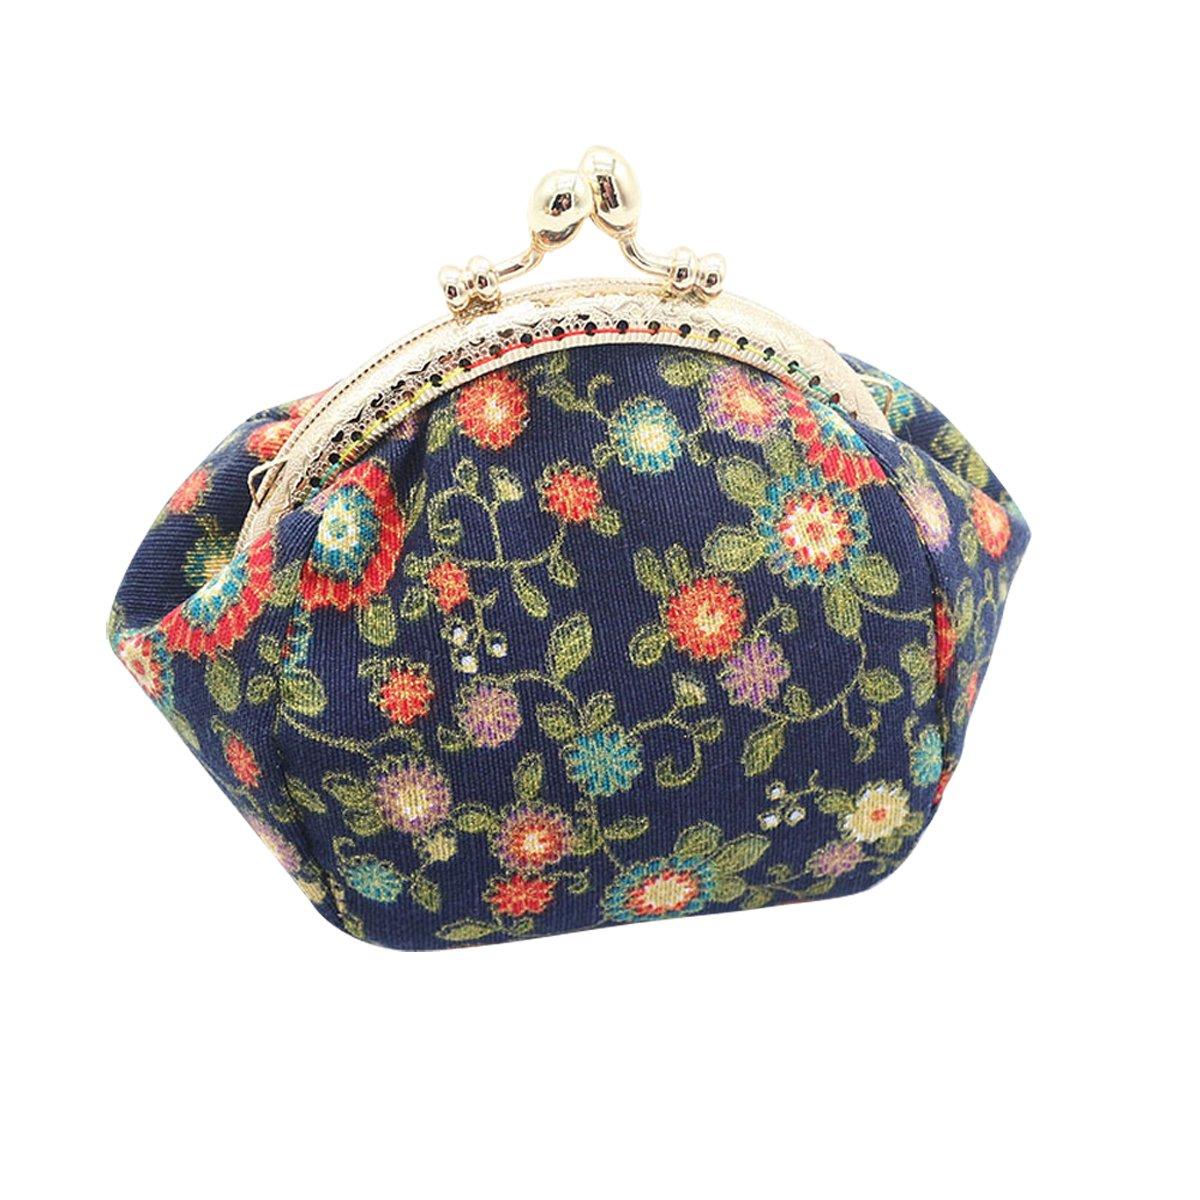 HeySun Girls Floral Slim Wallet Kiss-Lock Change Pocket Casual Coin Purse for Ladies 9fa-861bb2a